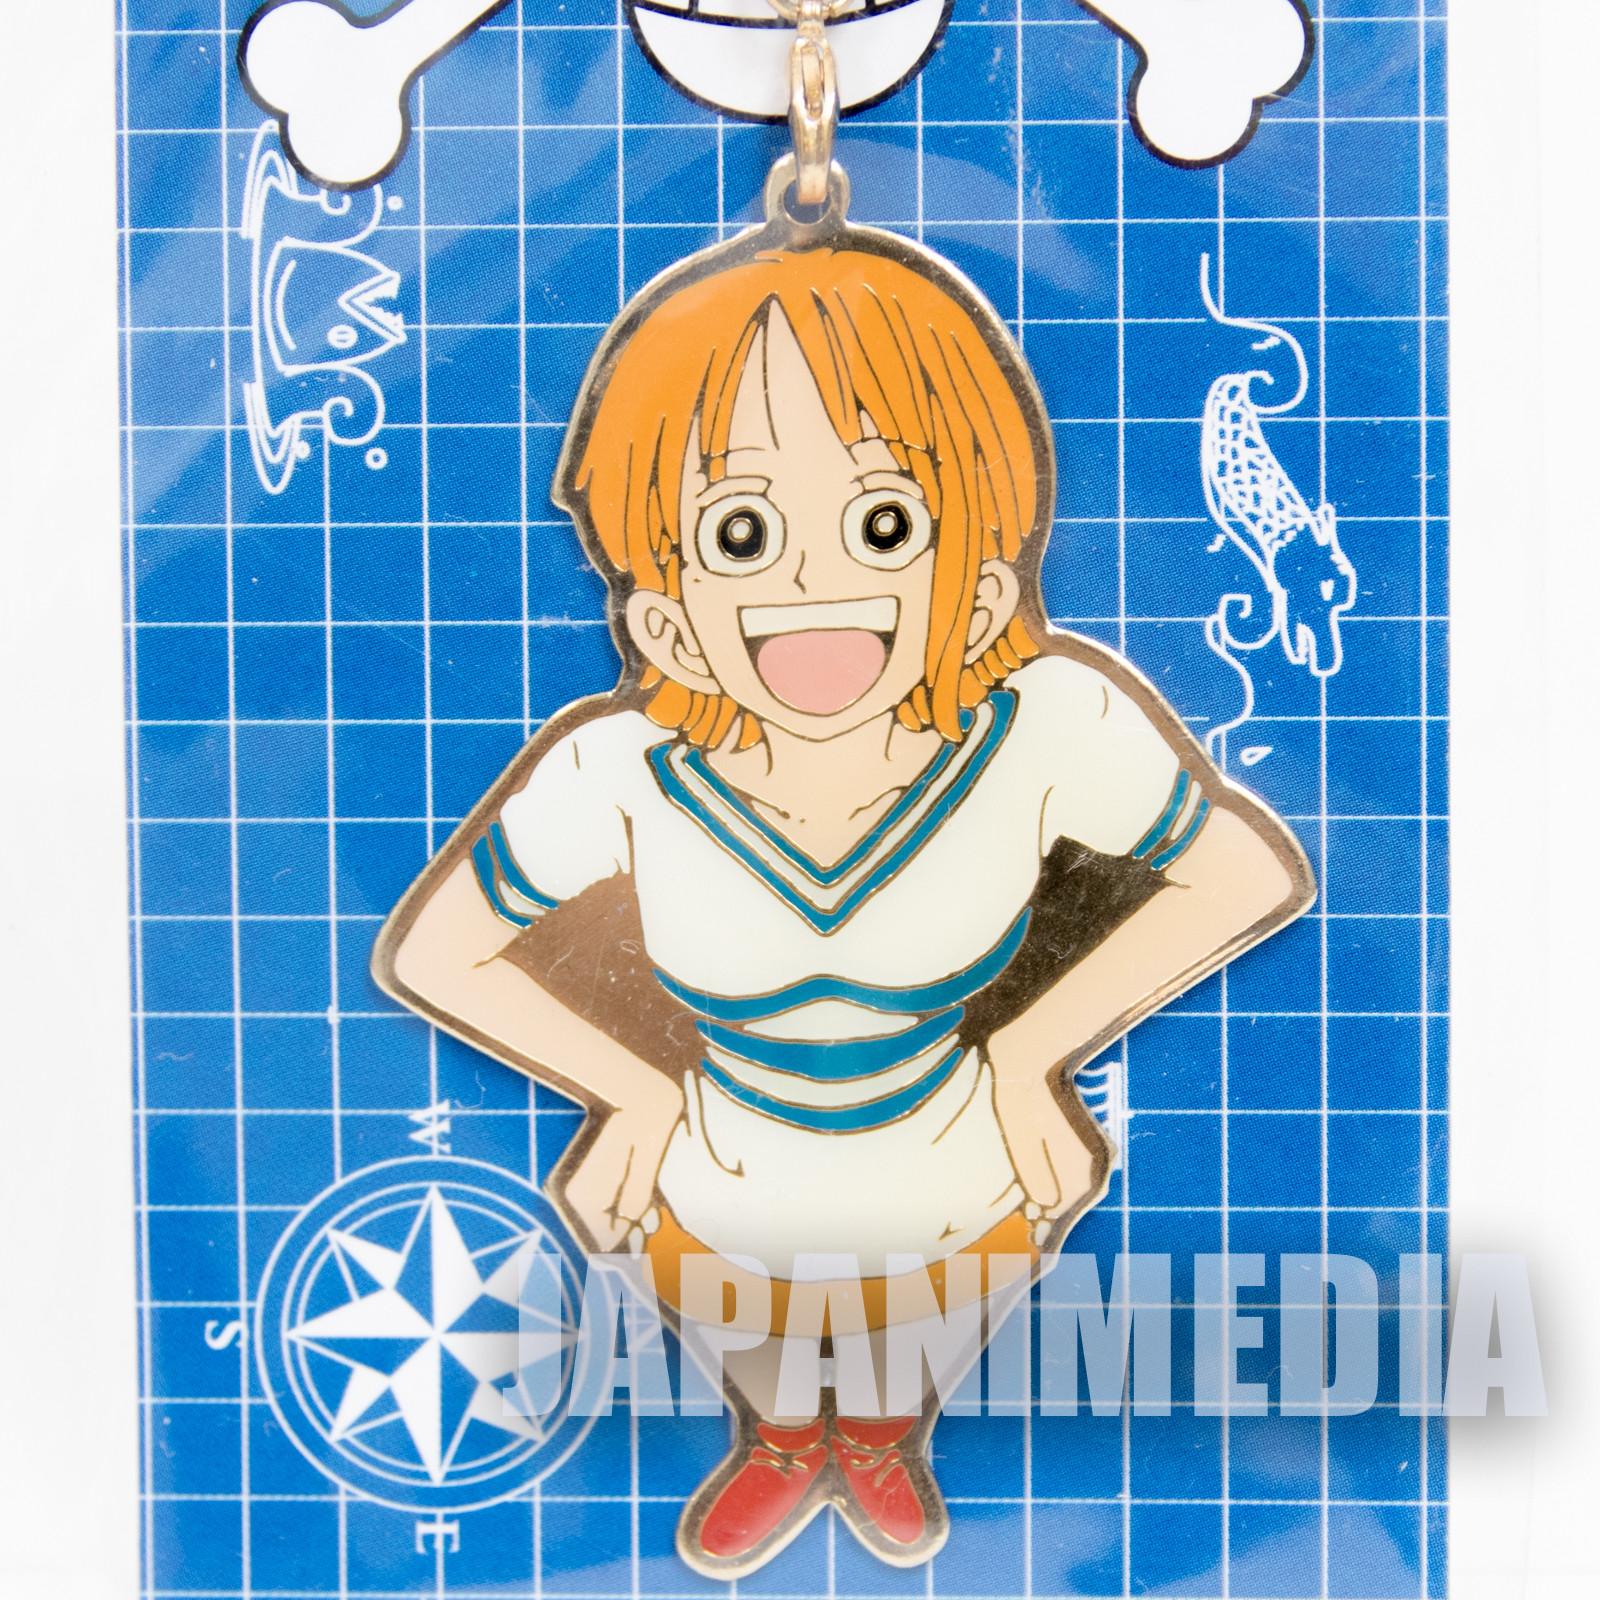 One Piece Nami Metal Charm Keychain Shonen Jump JAPAN ANIME